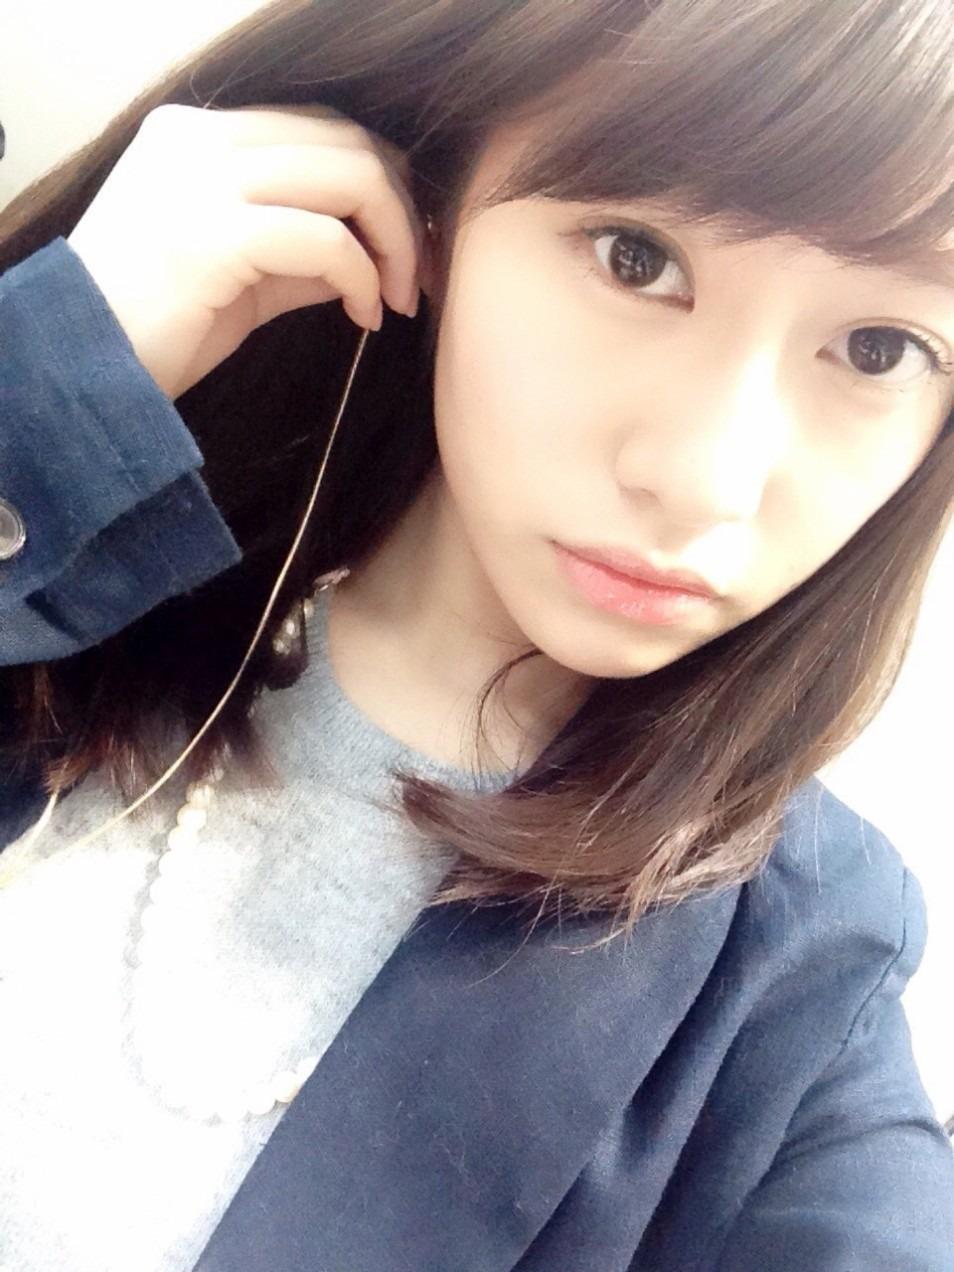 桜井玲香の画像 p1_31